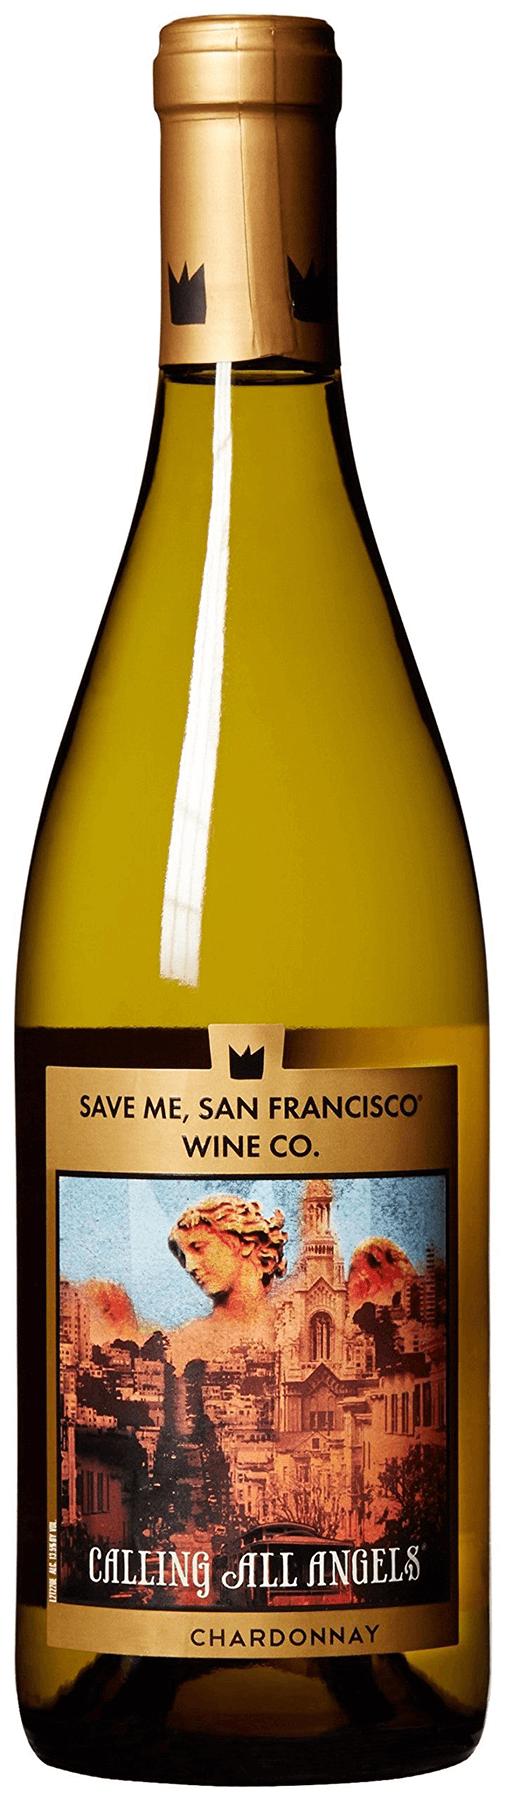 Save Me San Francisco Calling All Angels Chardonnay 2014